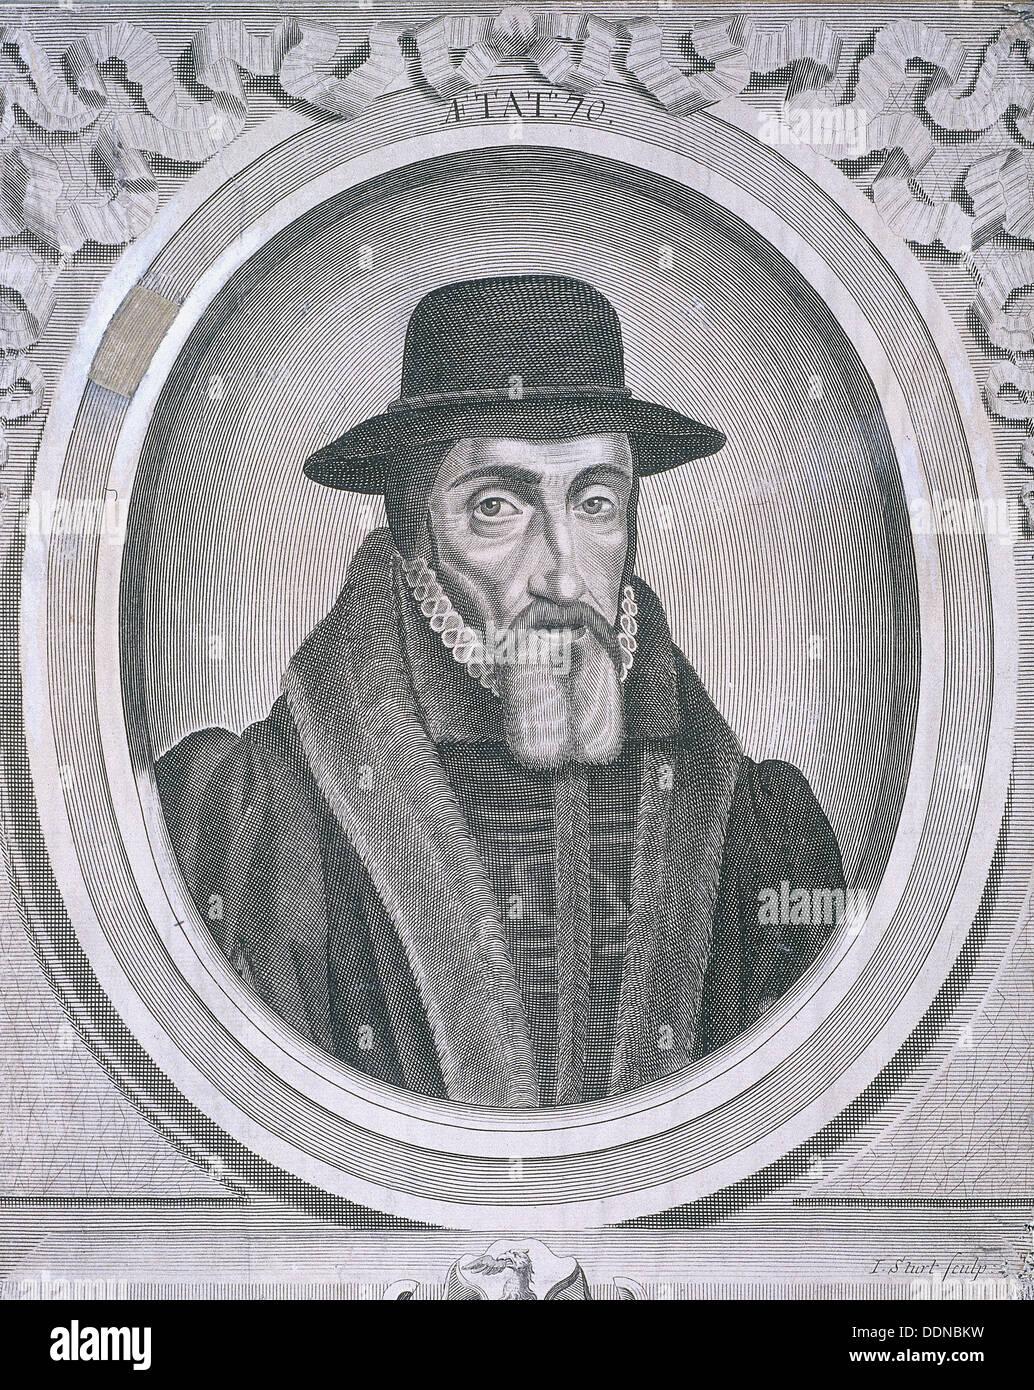 Oval portrait of John Foxe, c1570, (c1700). Artist: John Sturt - Stock Image